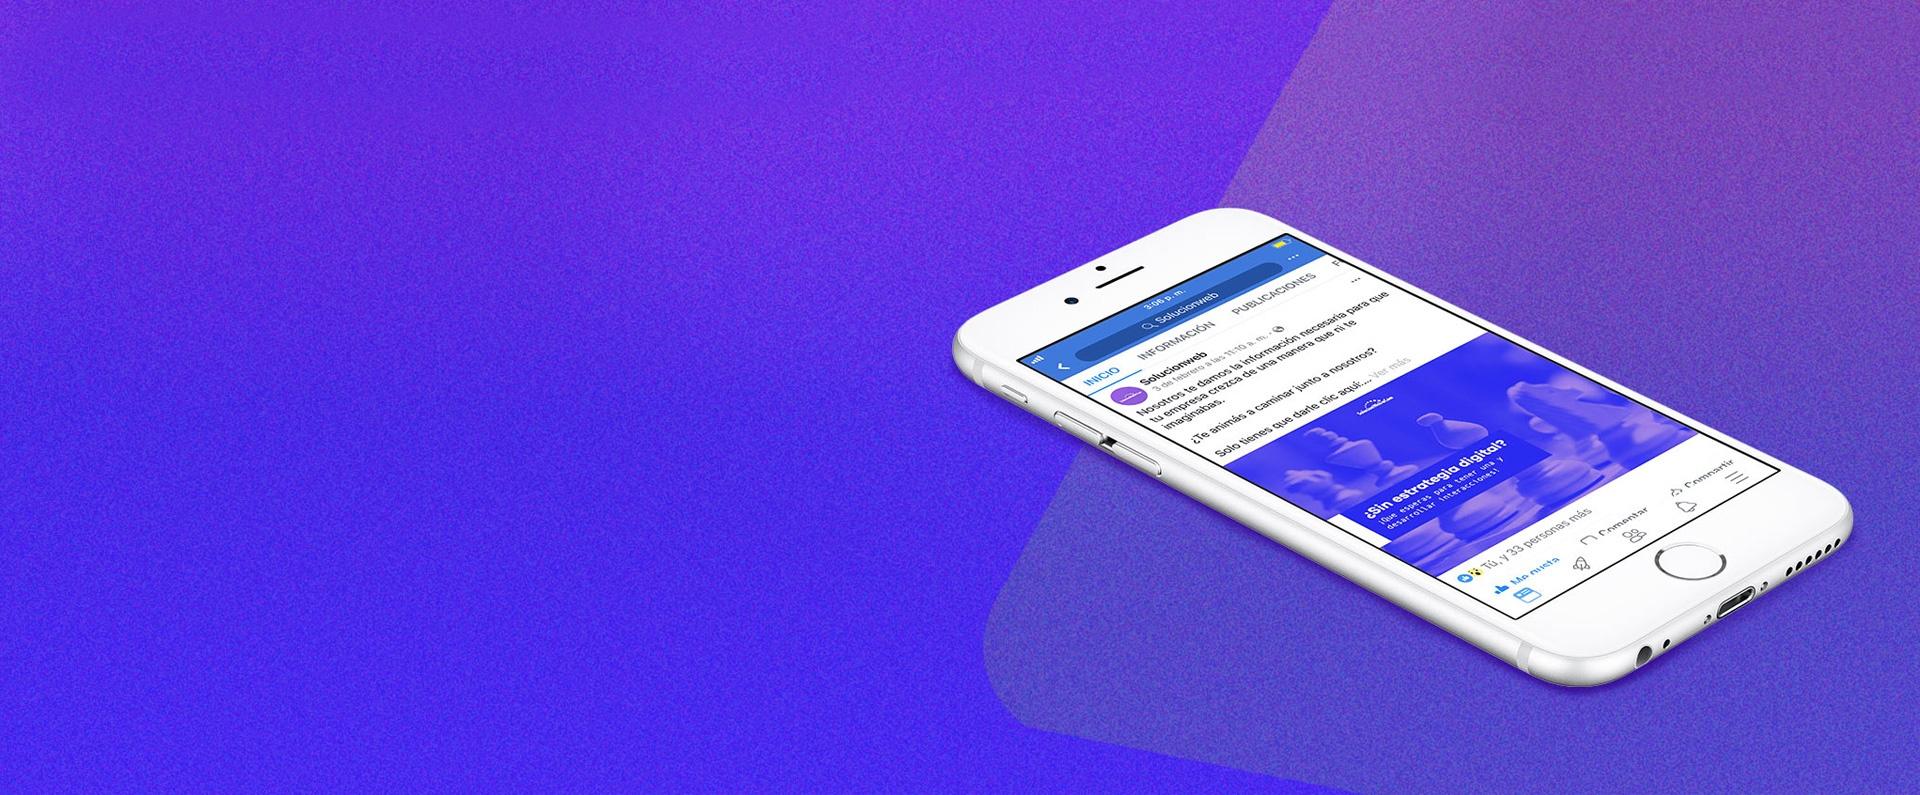 solucionweb-estrategia-digital-marketing-digital-inbound-marketing-redes-sociales-pagina-pilar.jpg